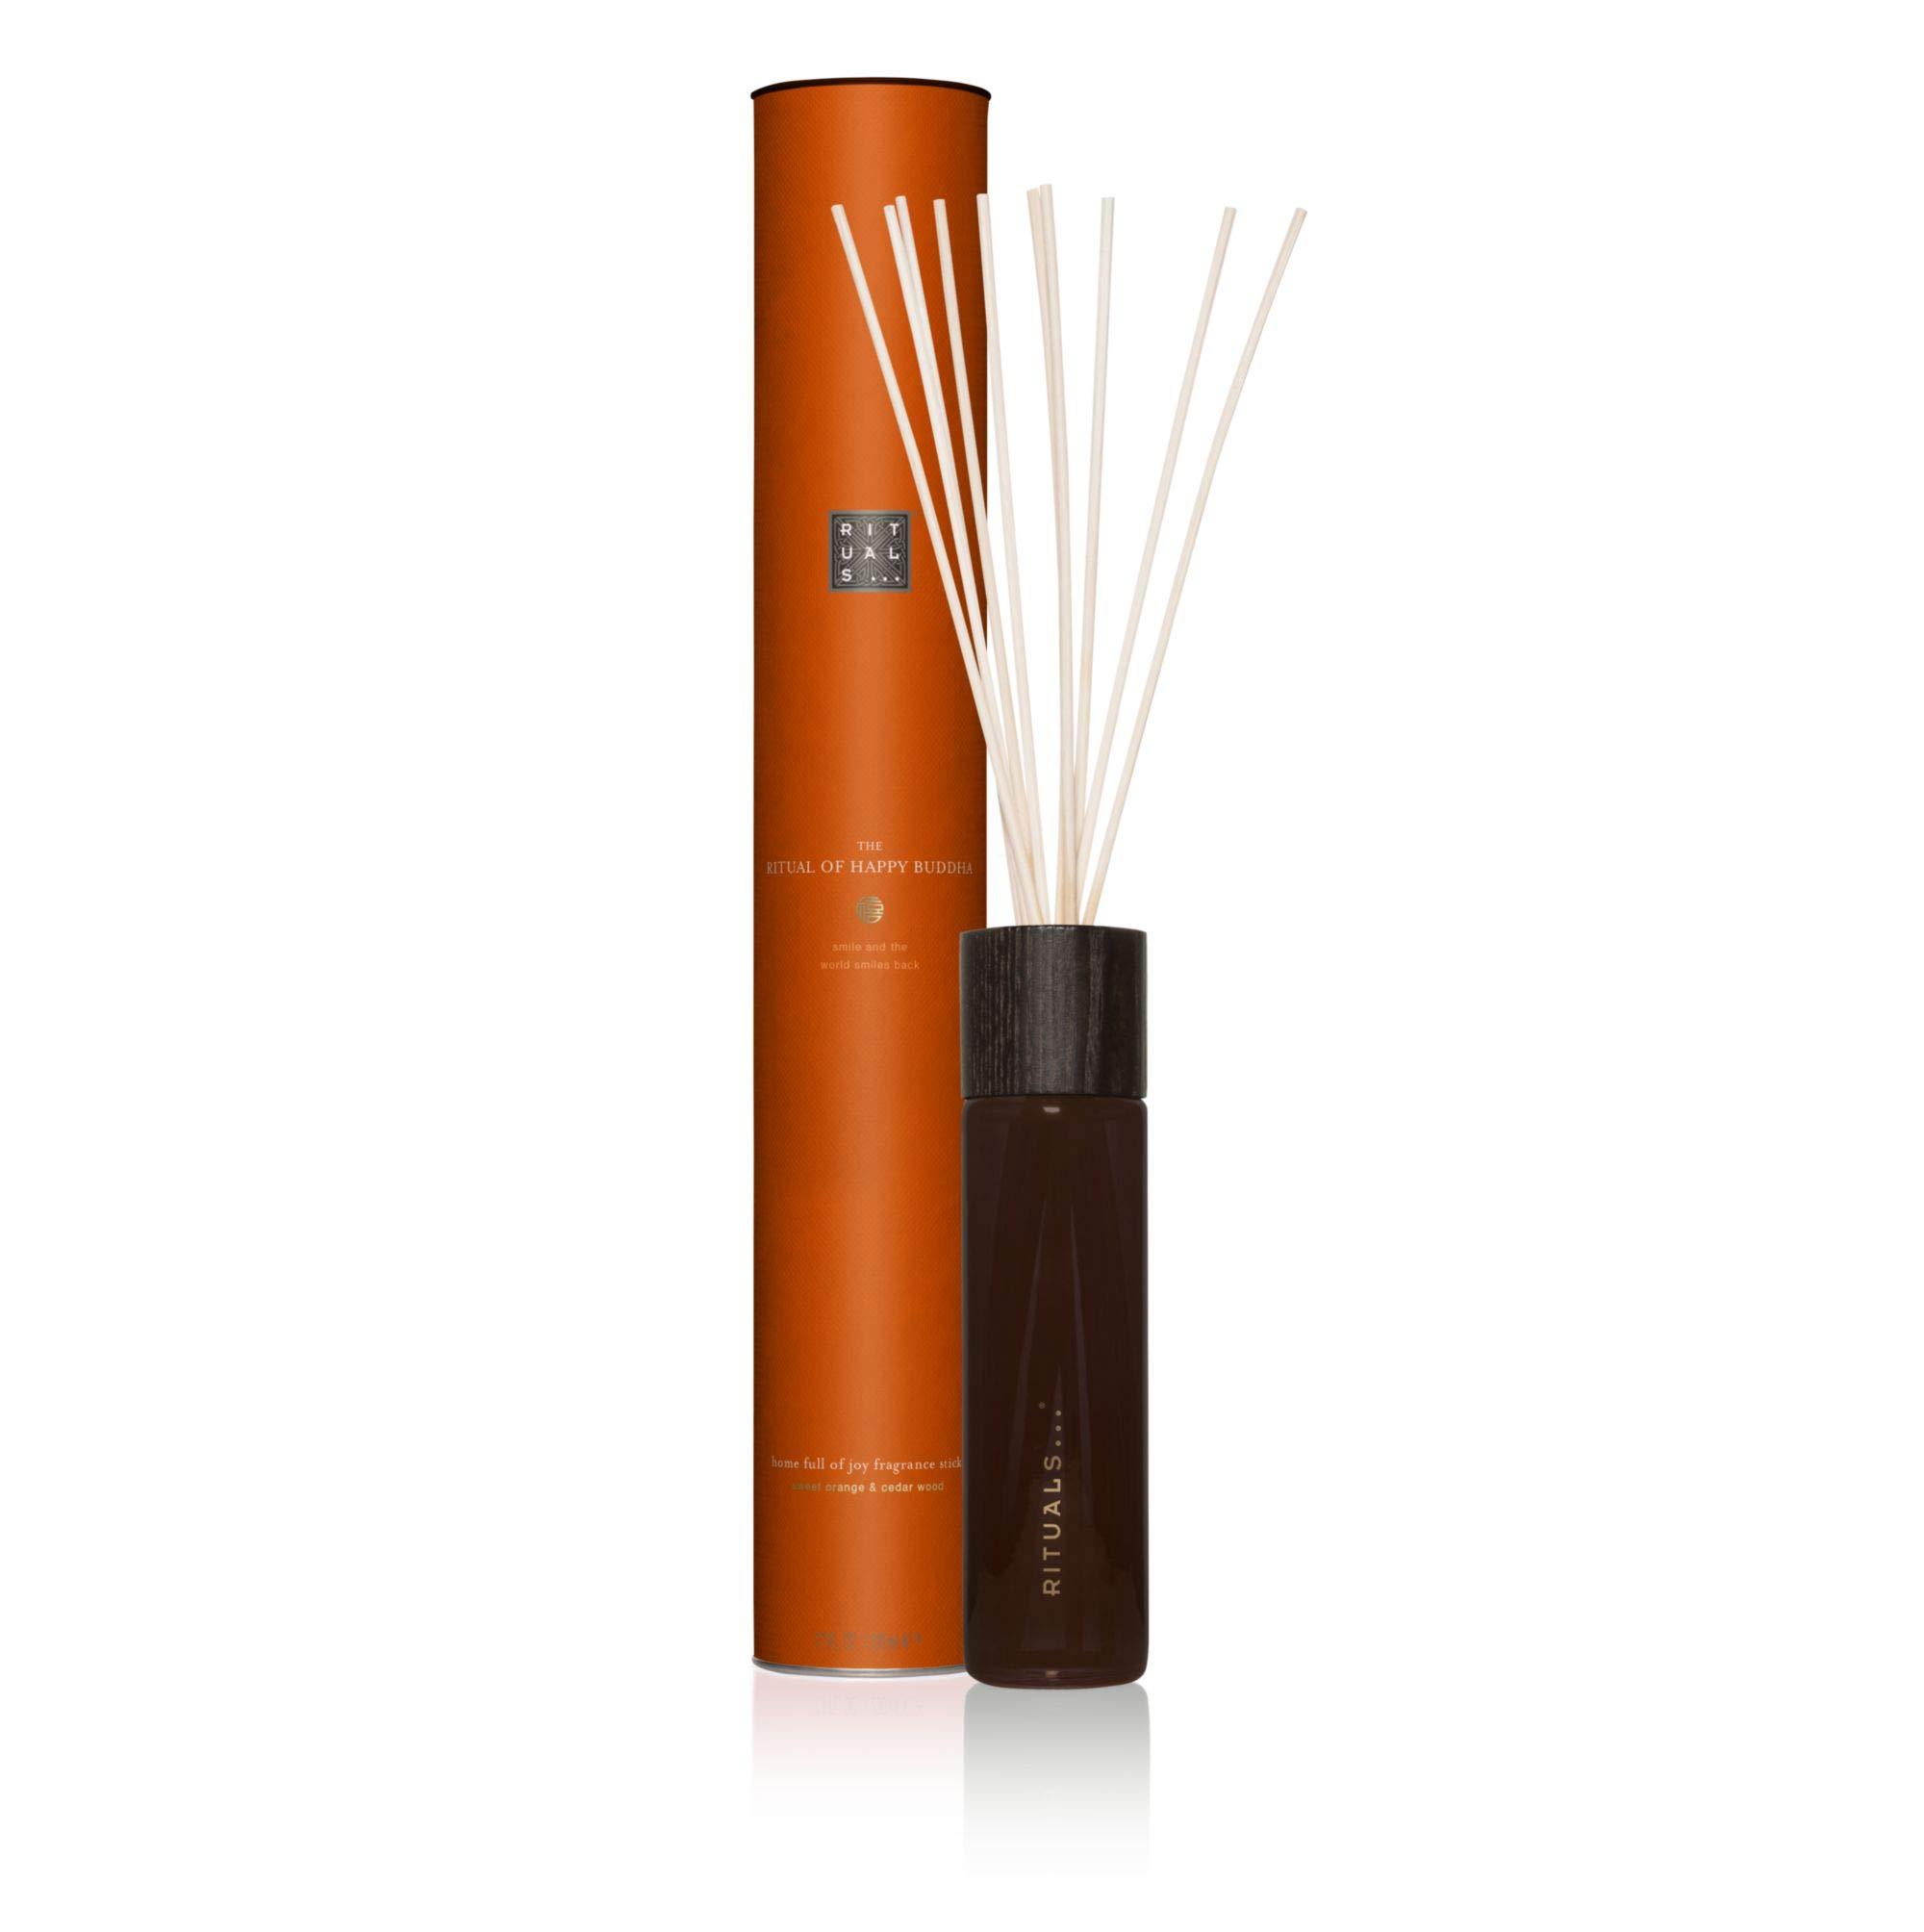 RITUALS The Rituals of Happy Buddha Large Fragrance Sticks, 230ml